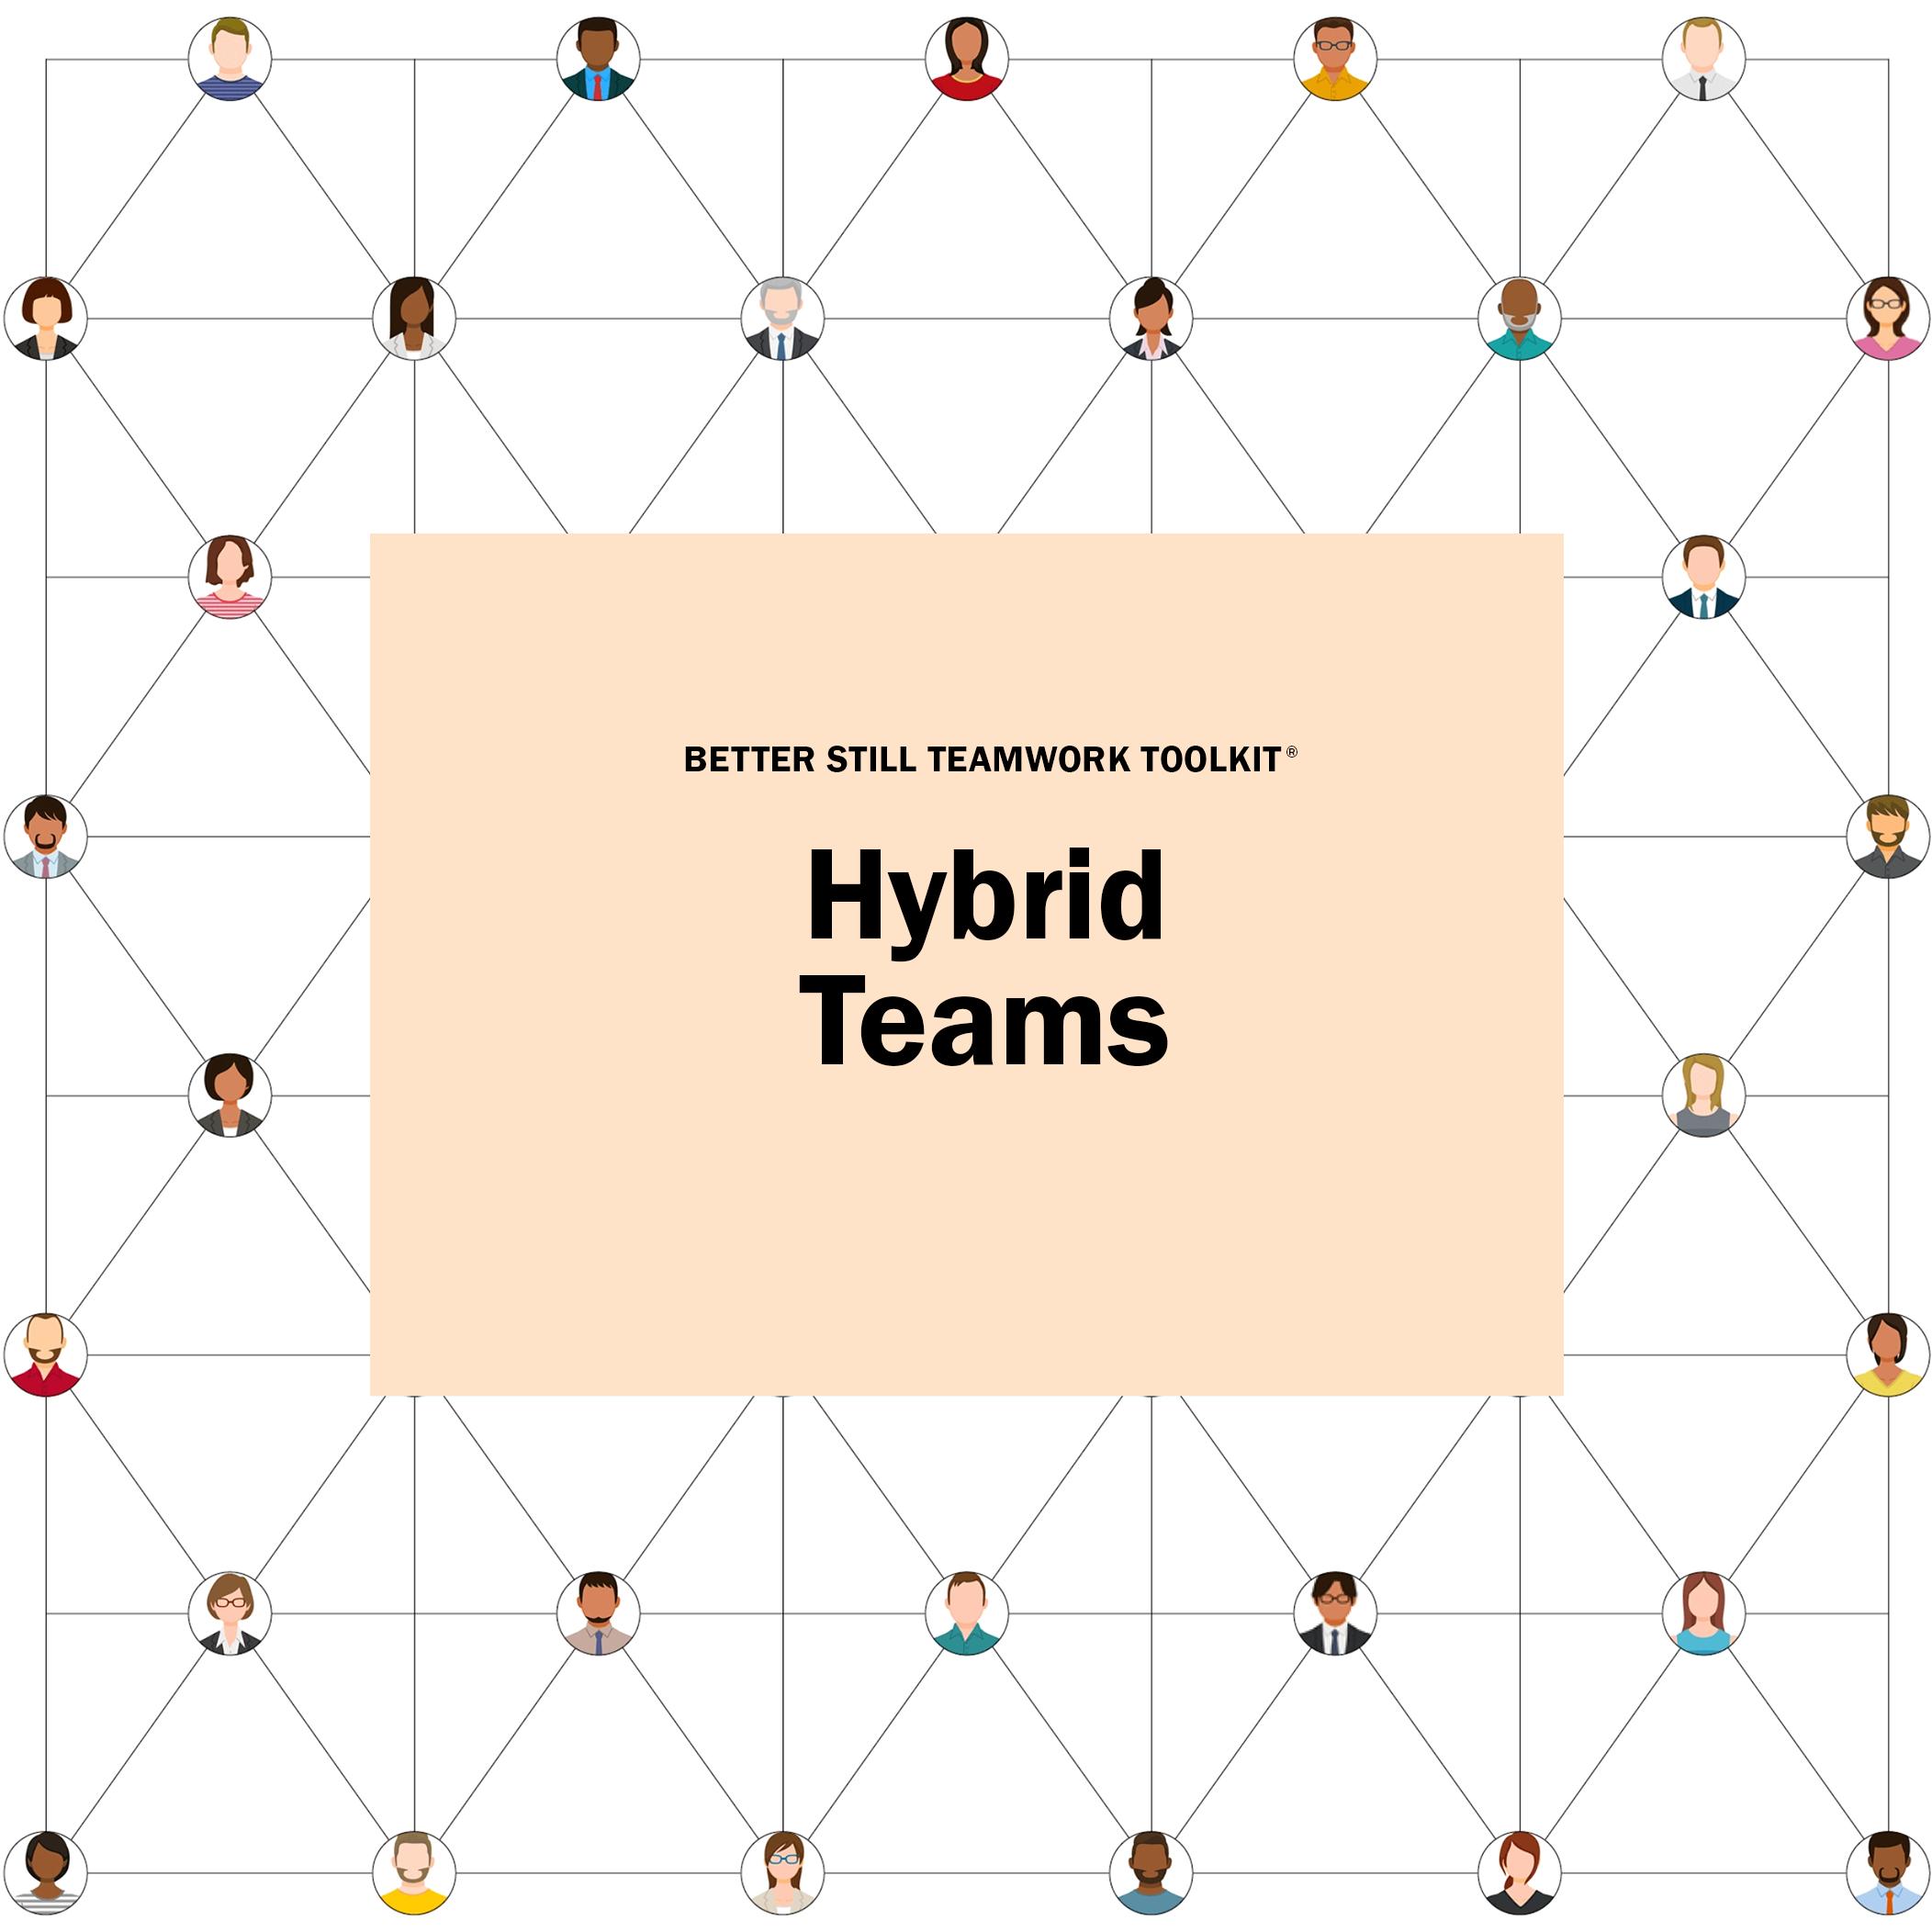 Better Still Teamwork Toolkit for Hybrid Teams